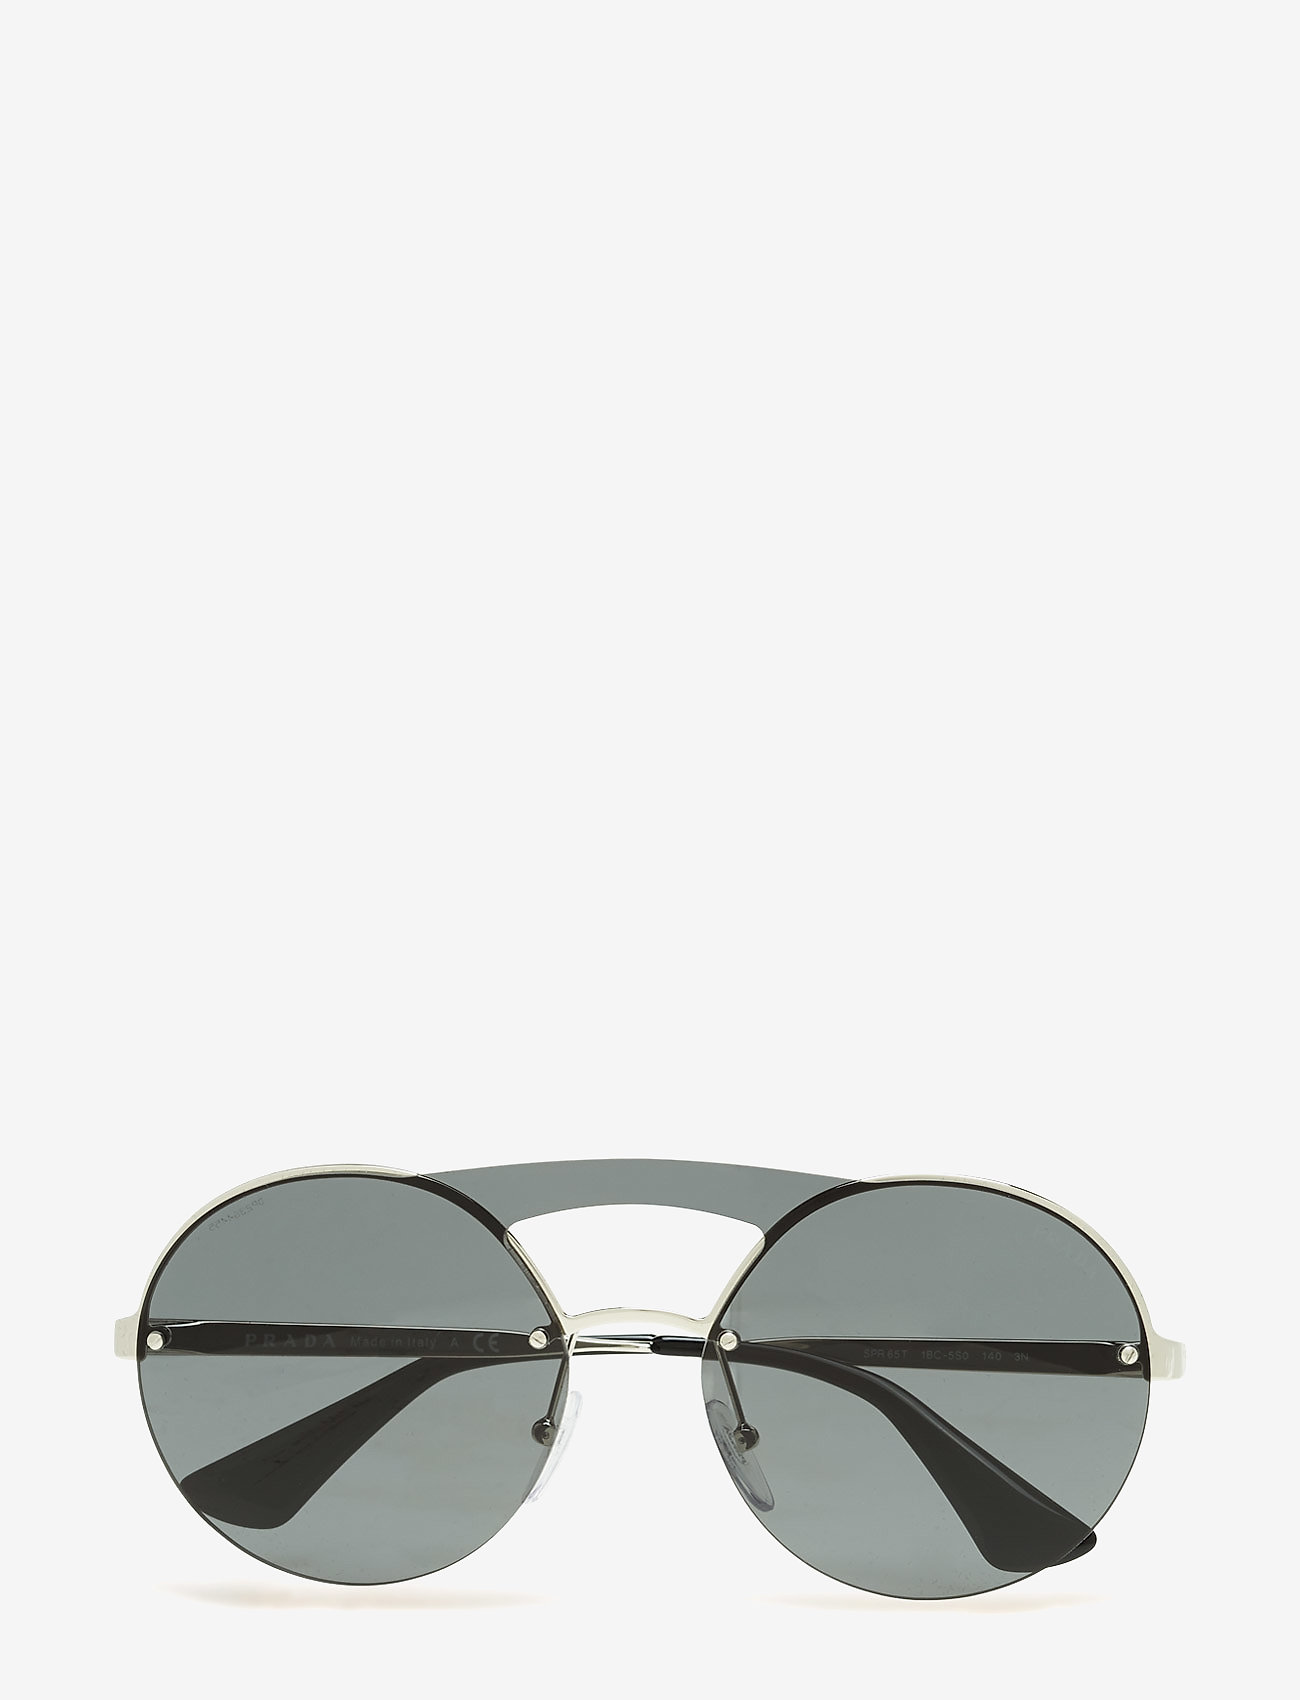 Prada Sunglasses - Not Defined - round frame - silver/multi - 0